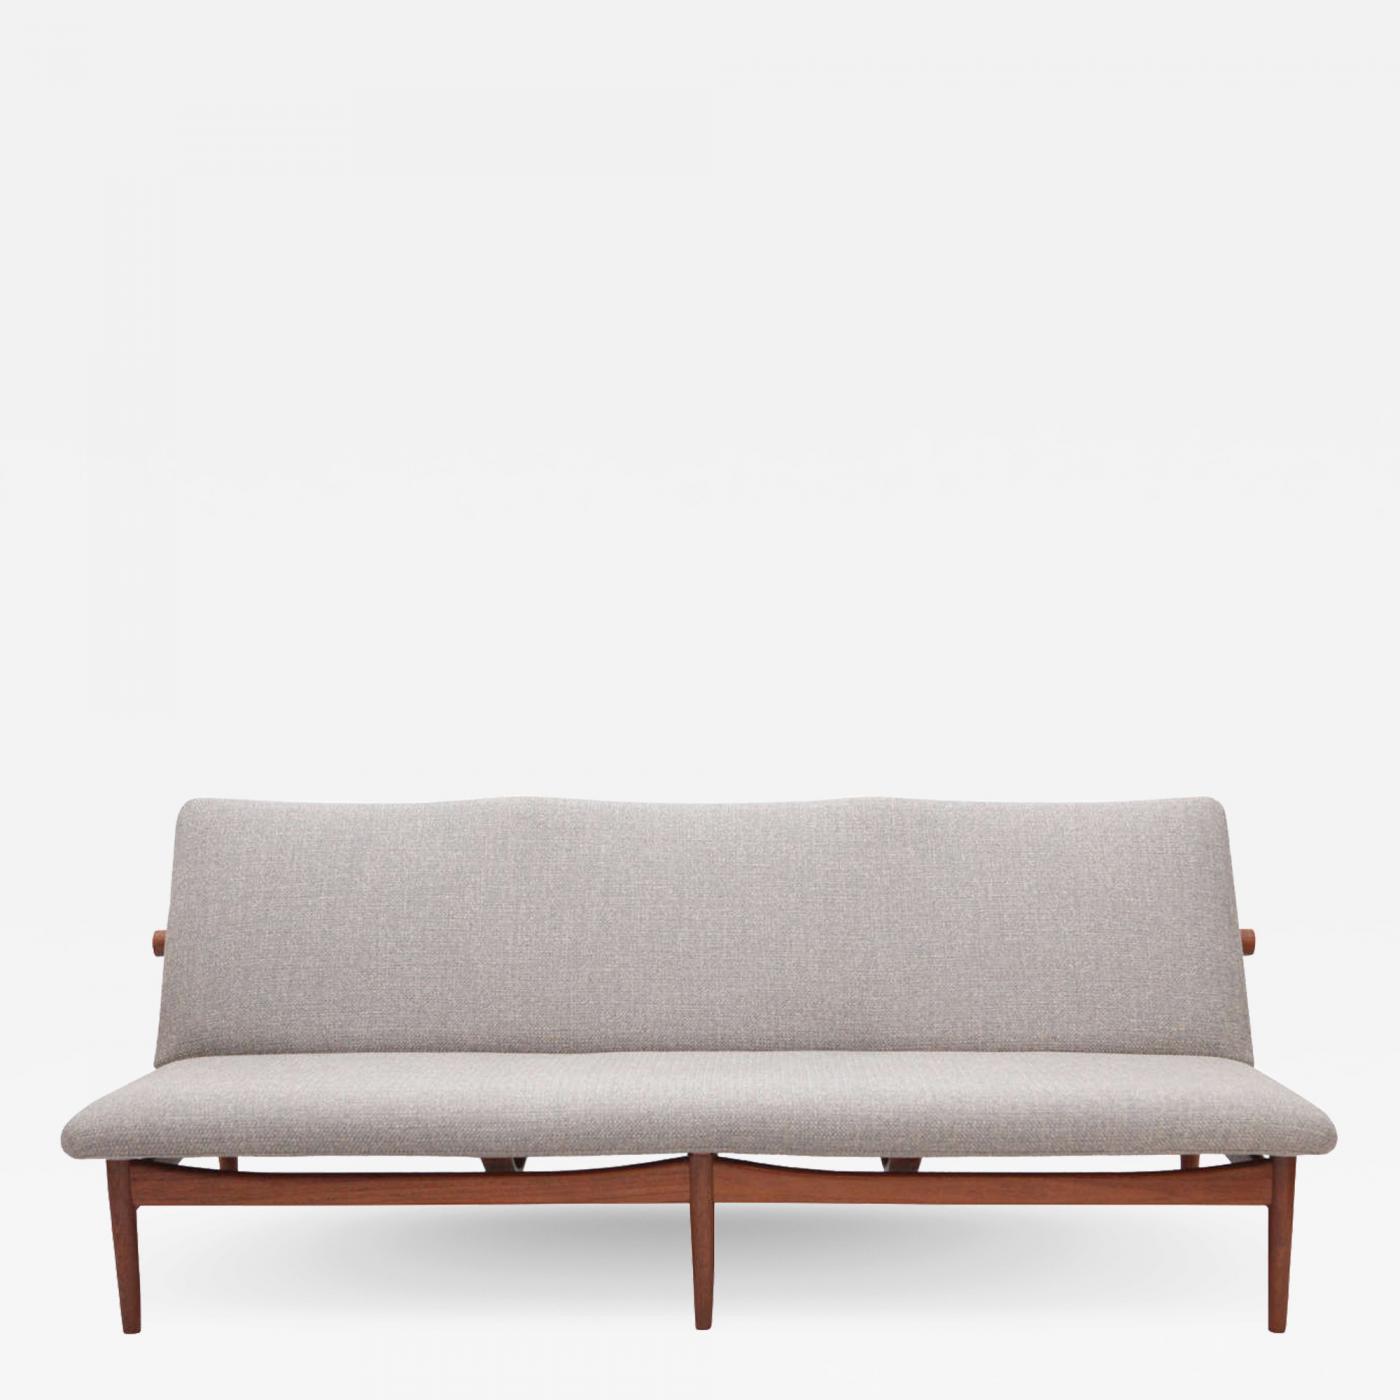 Merveilleux Listings / Furniture / Seating / Sofas · Finn Juhl ...